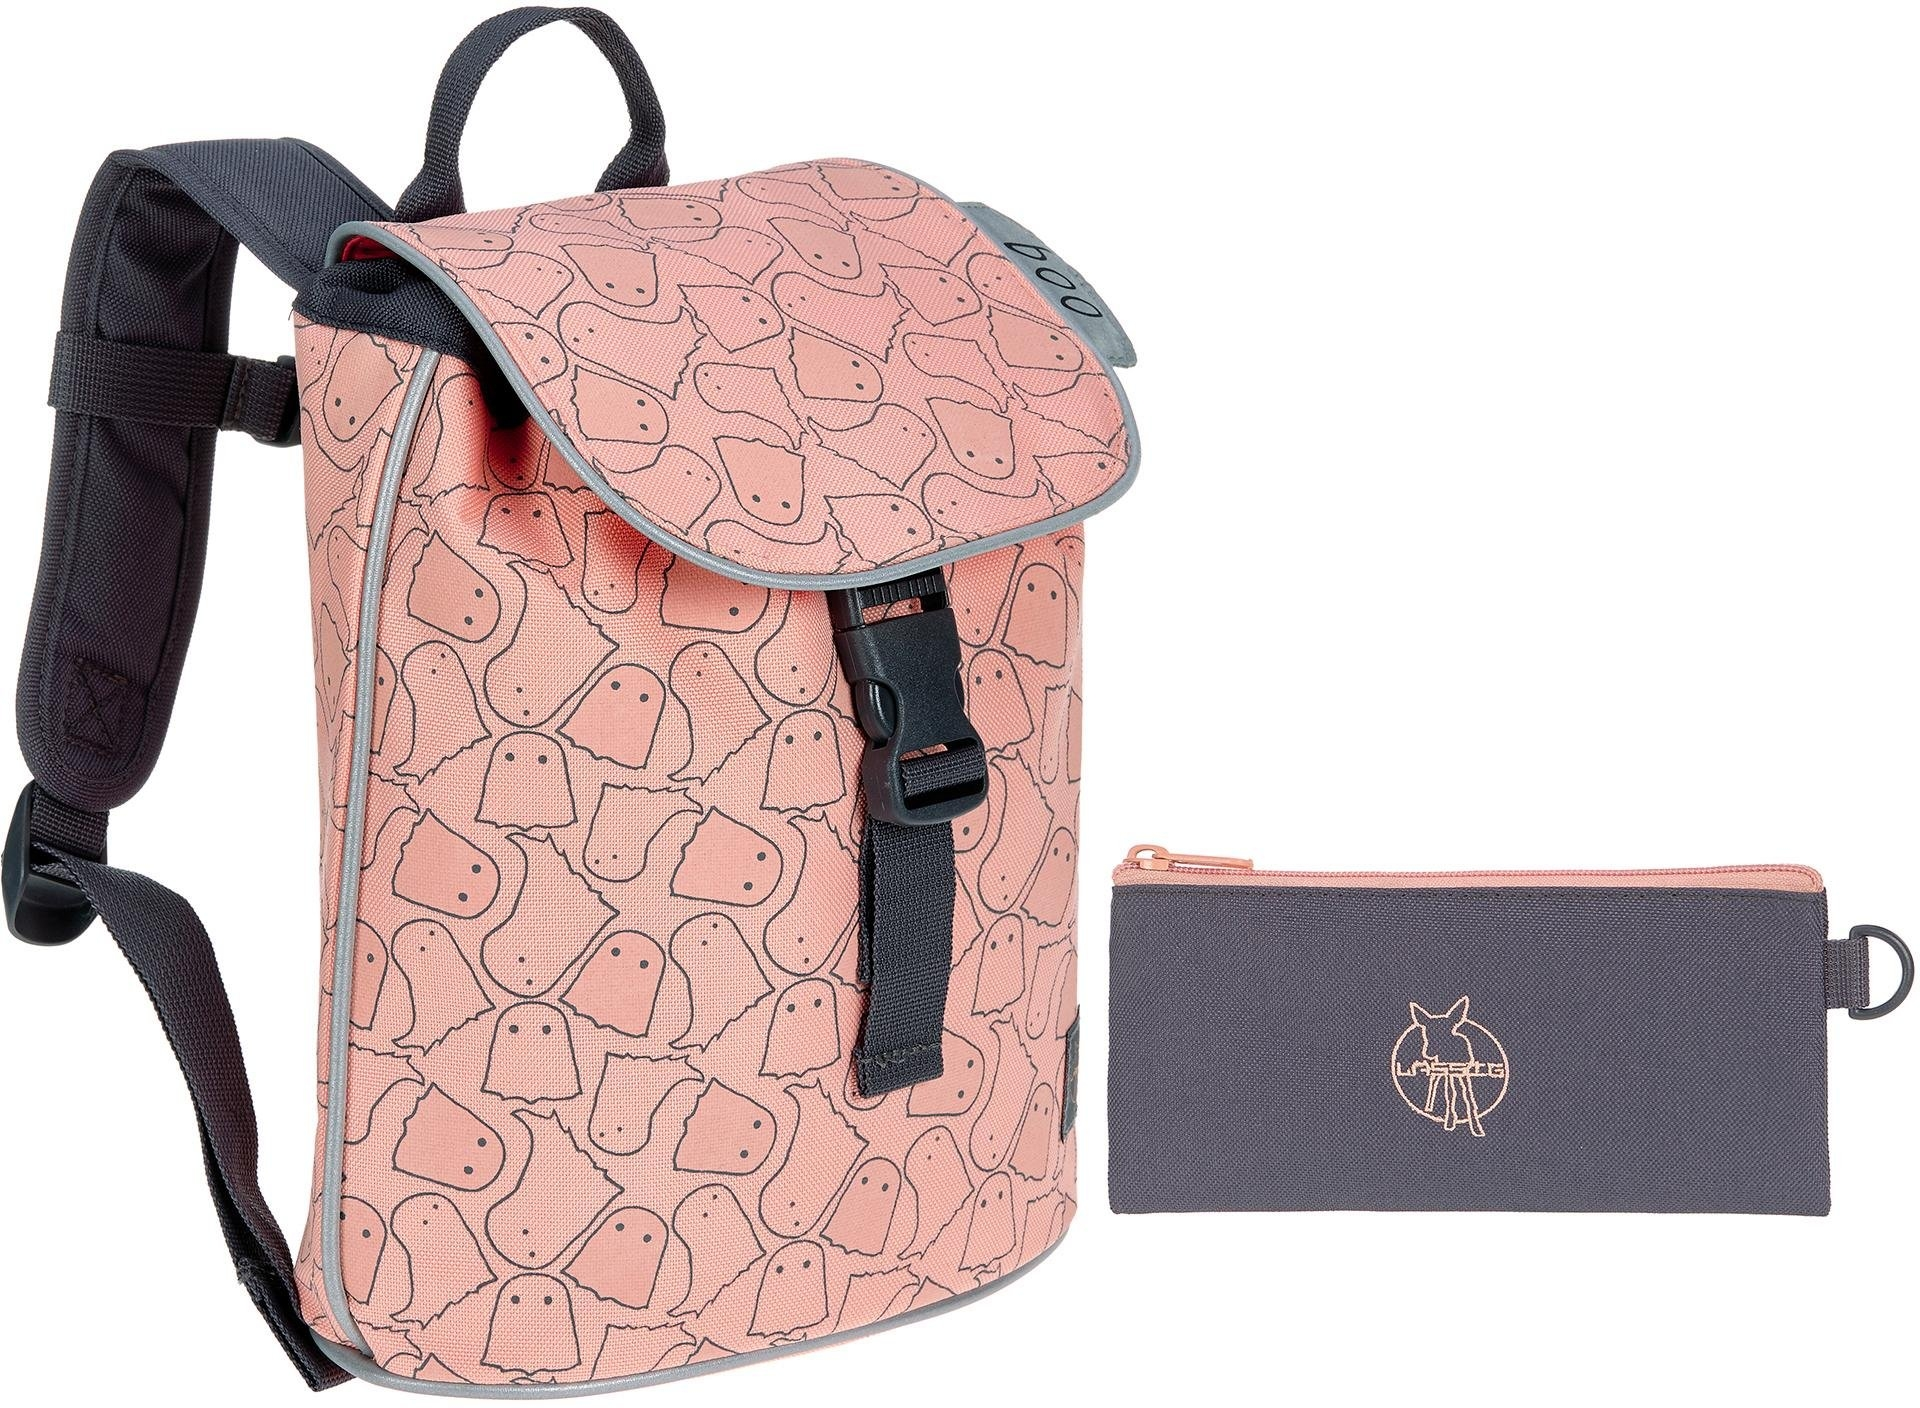 Lässig kinderrugzak, »4Kids Mini Duffle Backpack, Spooky Peach« nu online kopen bij OTTO